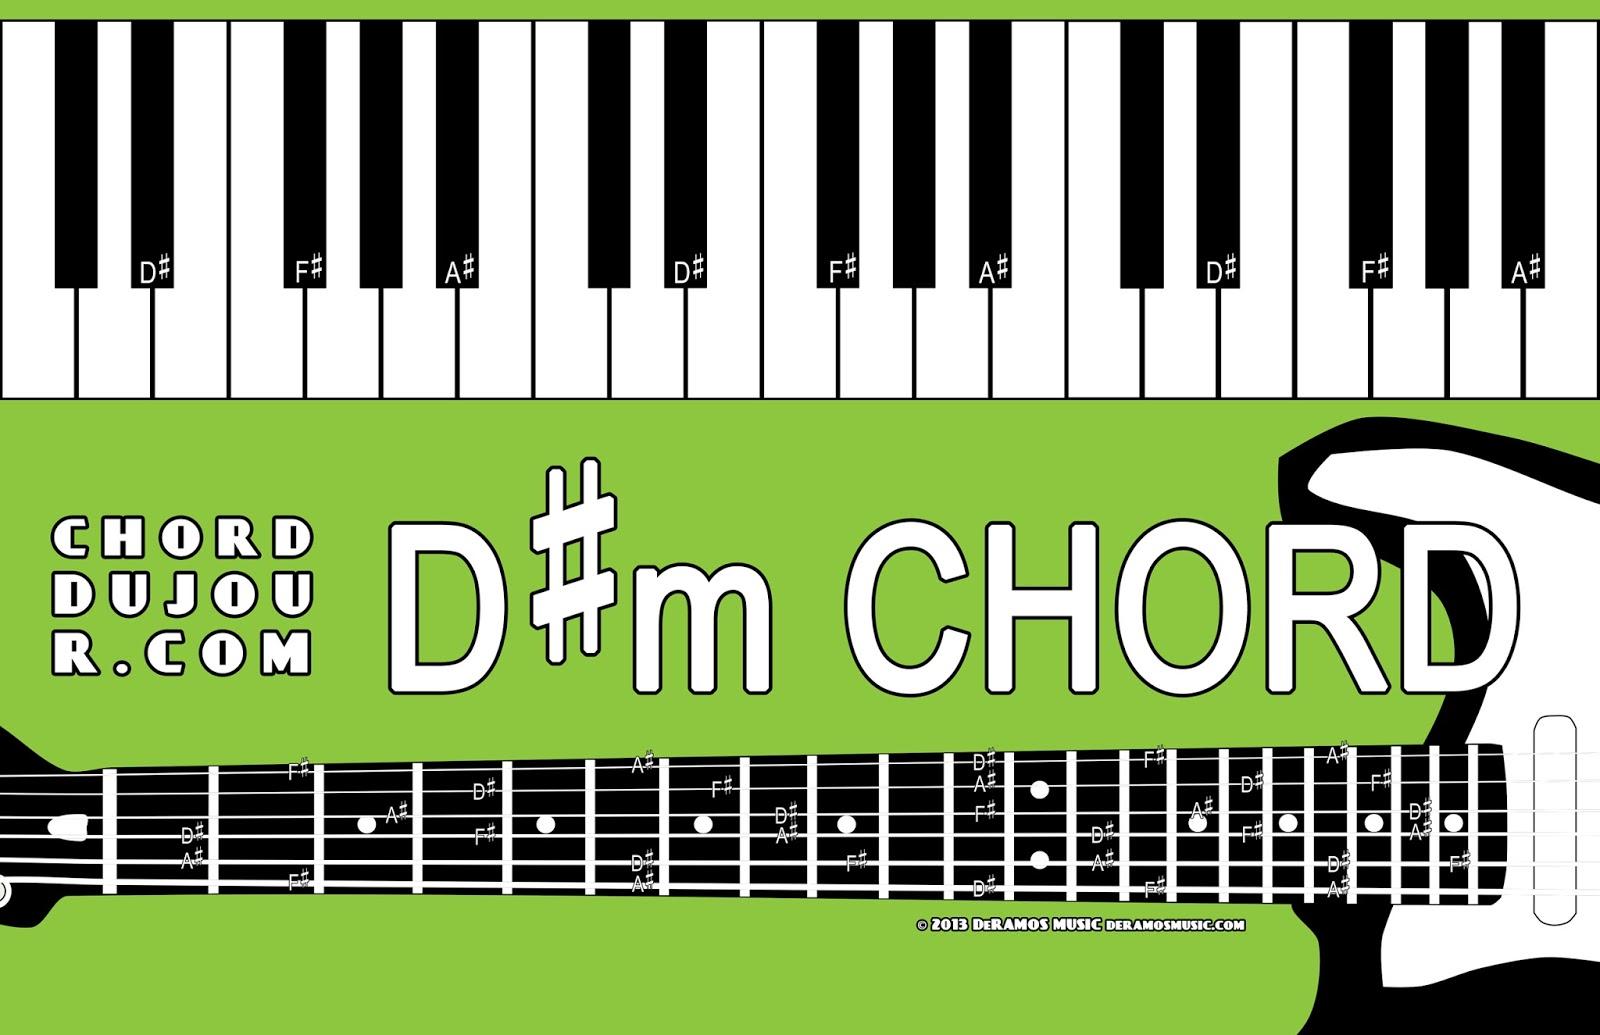 Chord du jour dictionary dm chord dictionary dm chord hexwebz Gallery